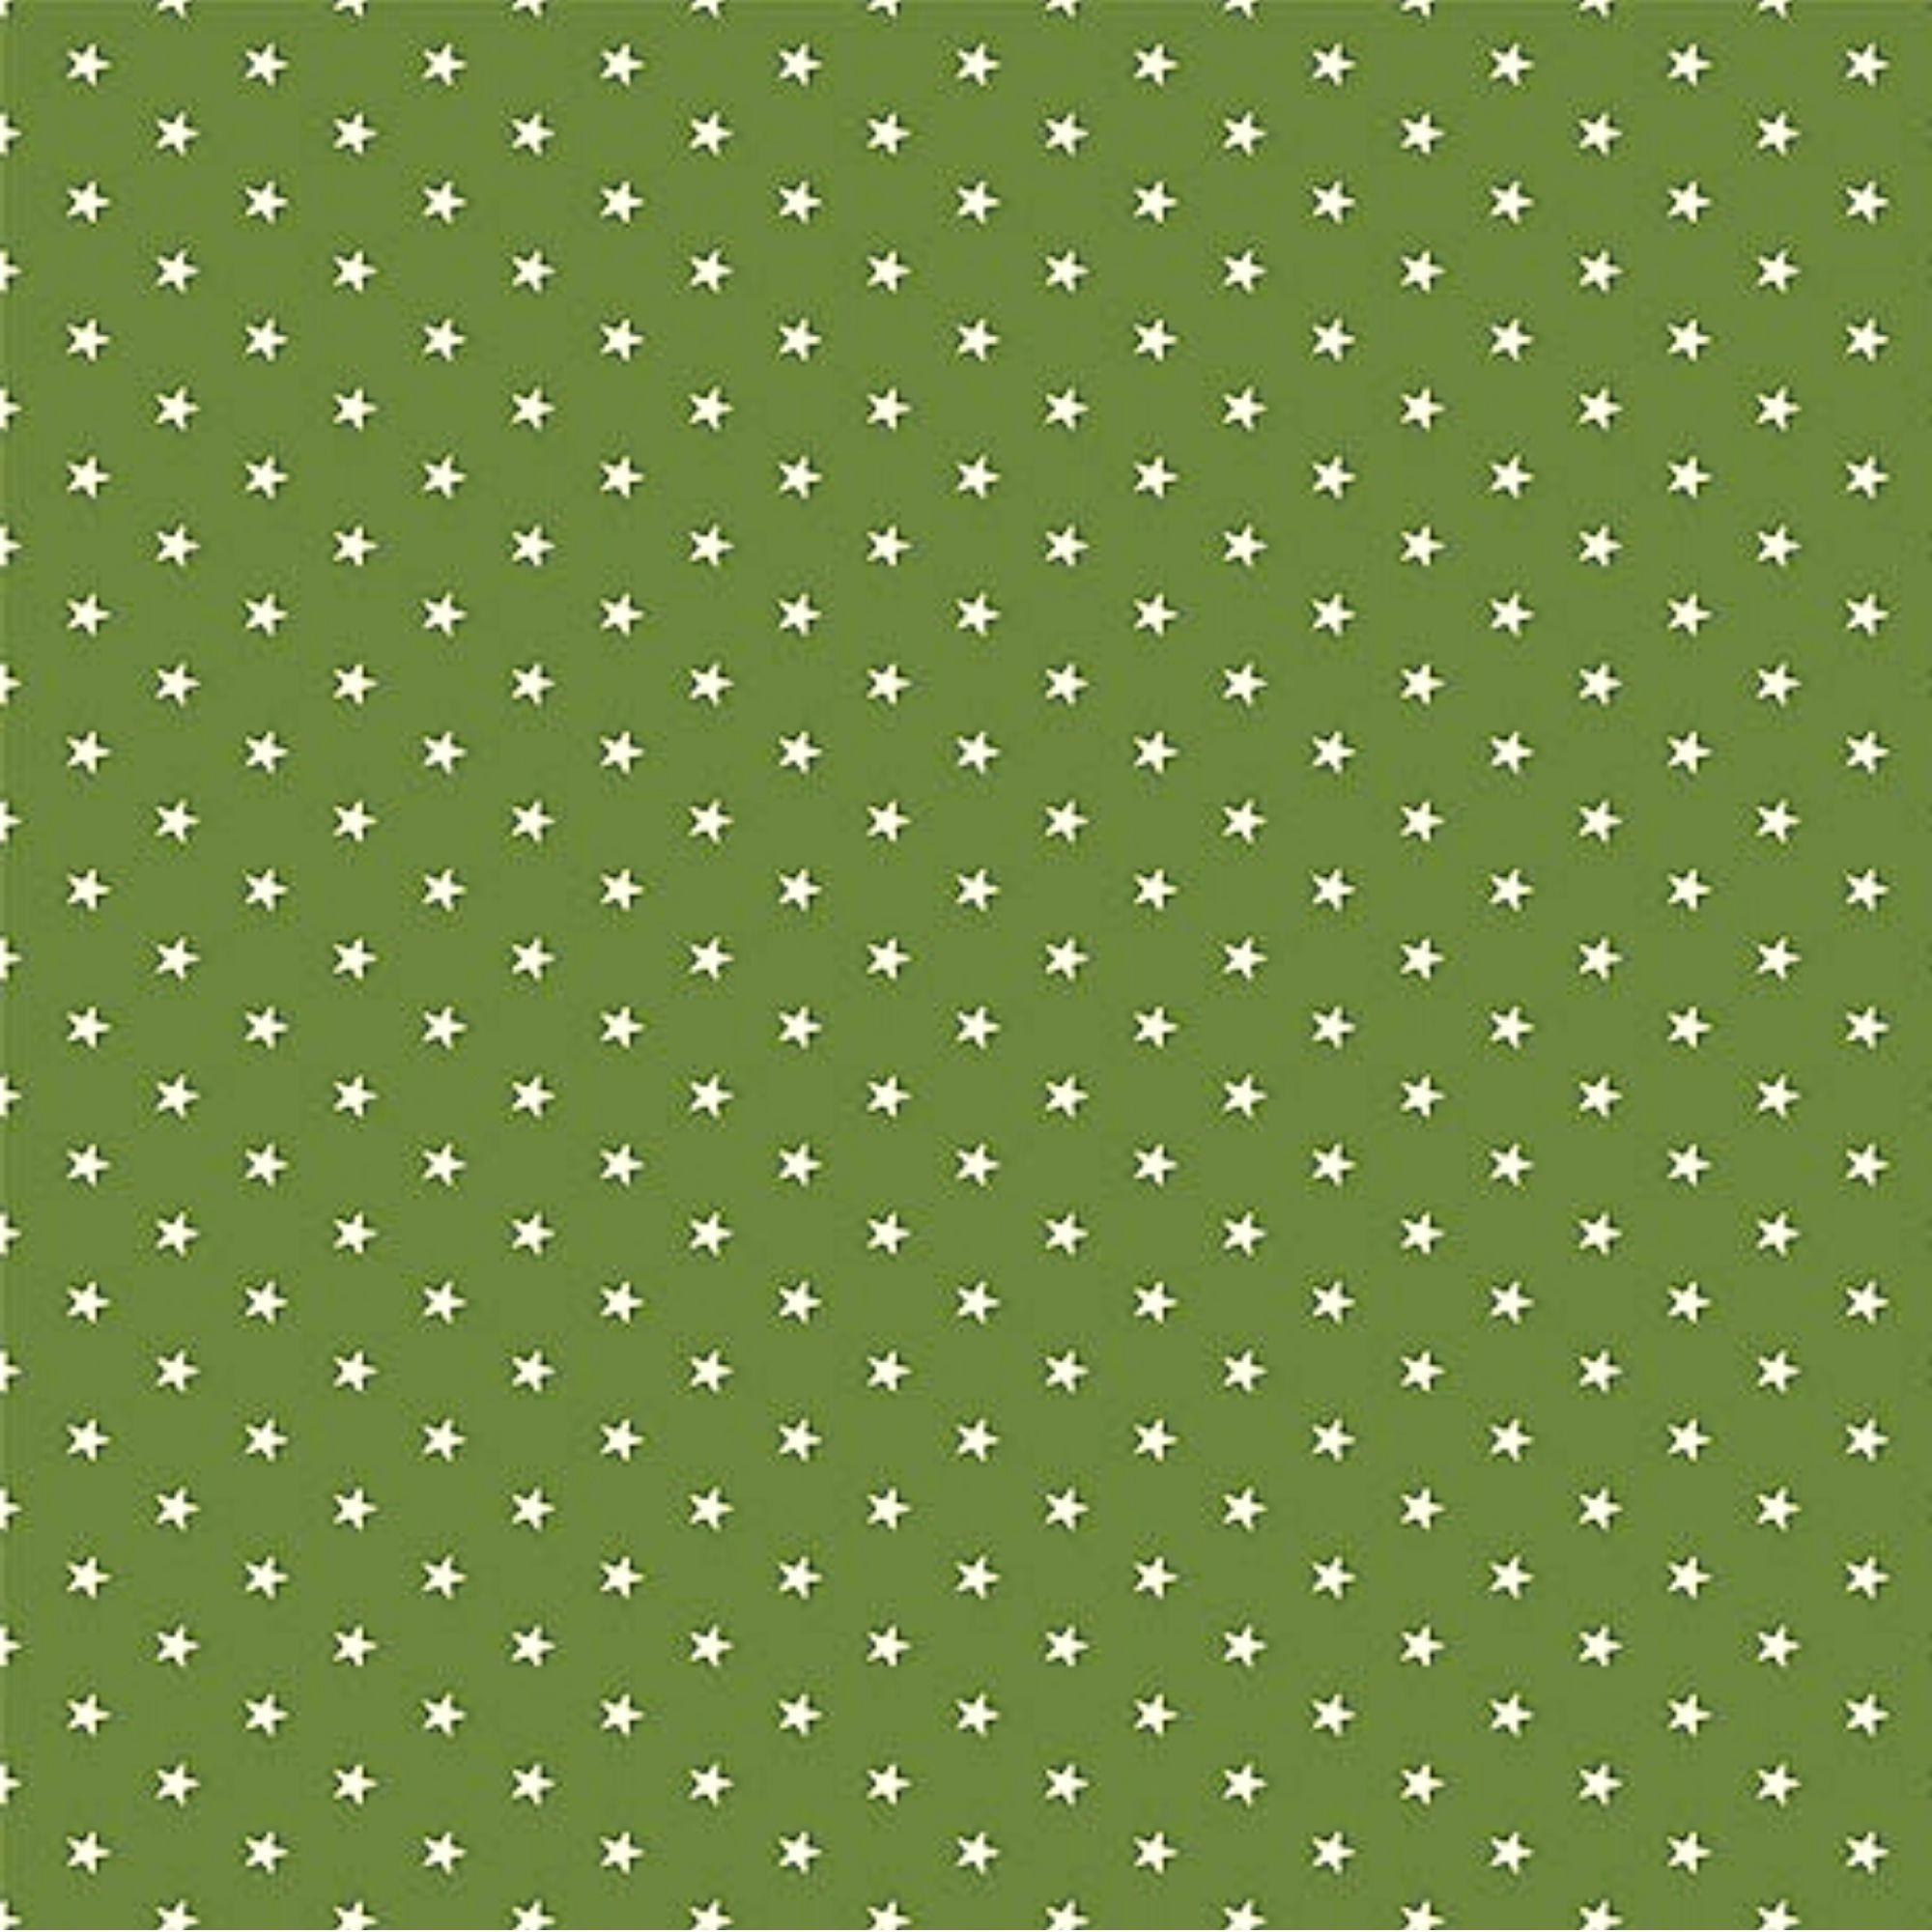 Tecido Tricoline  Estampa Mini Estrela Branca - Fundo Verde Arruda - Preço de 50 cm X 150 cm